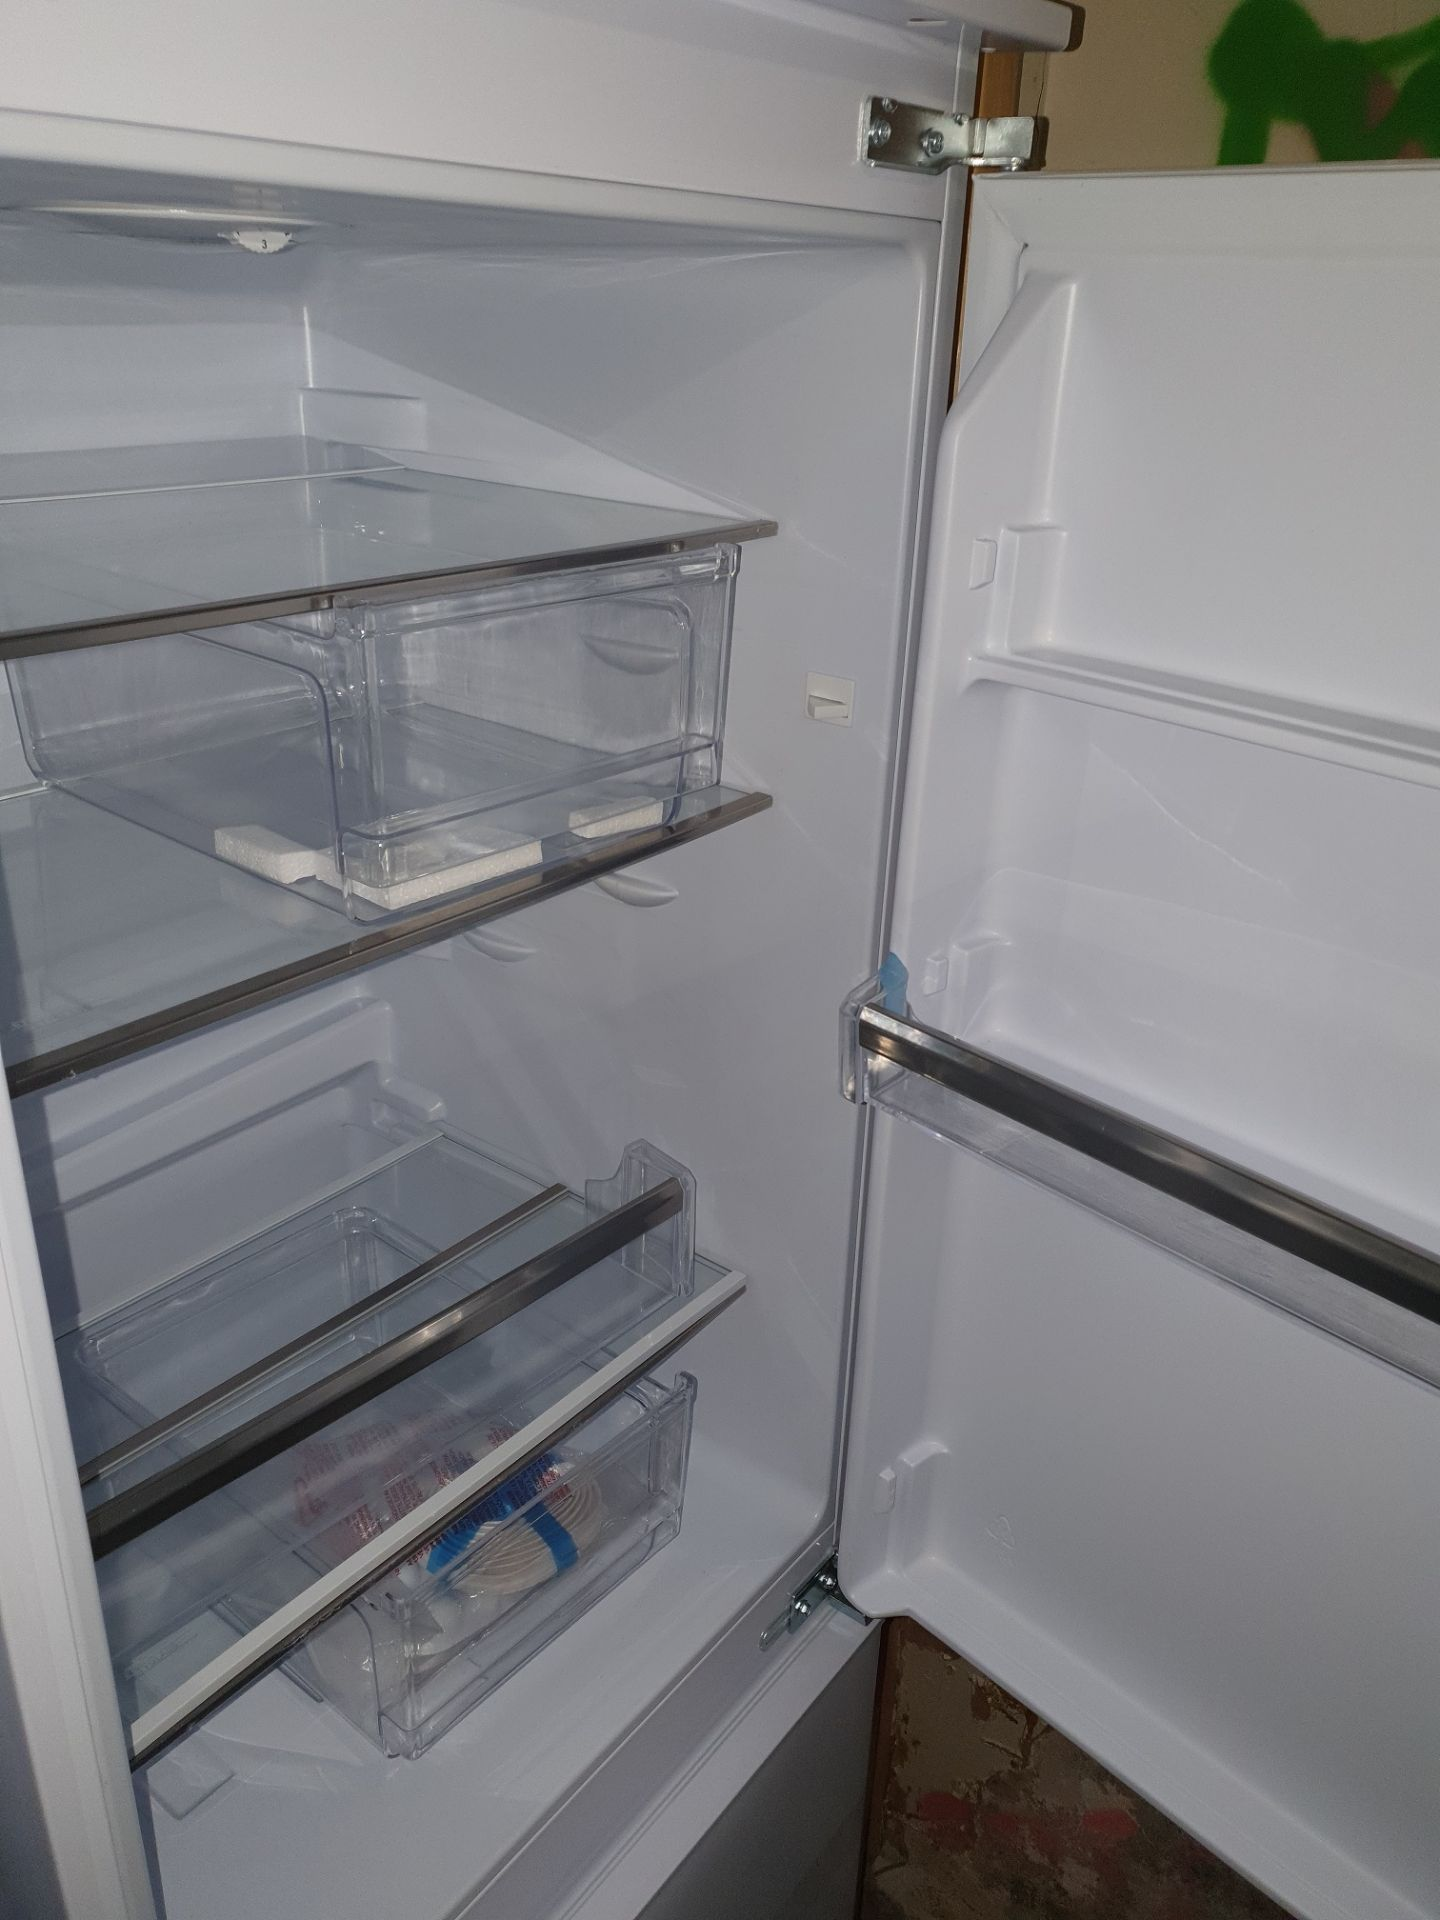 NEW/GRADED AND UNPACKAGED Zanussi ZBB28441SV Integrated 70/30 Fridge Freezer (Brand new slight - Image 13 of 14